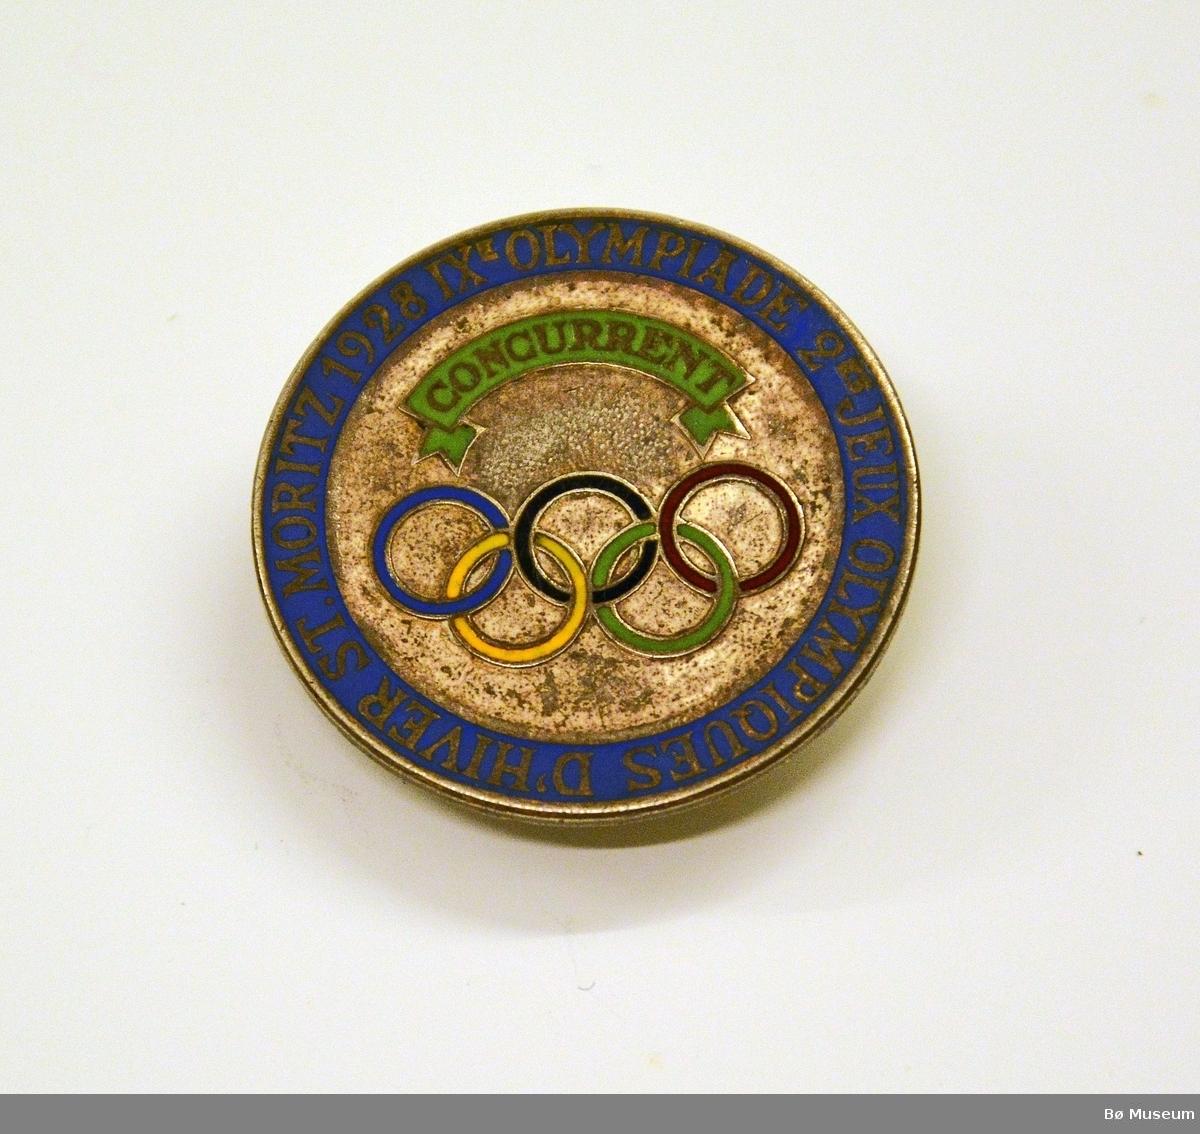 Deltakermedalje (pin) Innskrift: IX OLYMPIADE 2 JEUX OLYPIQUES D'HIVER ST. MORITZ 1928.